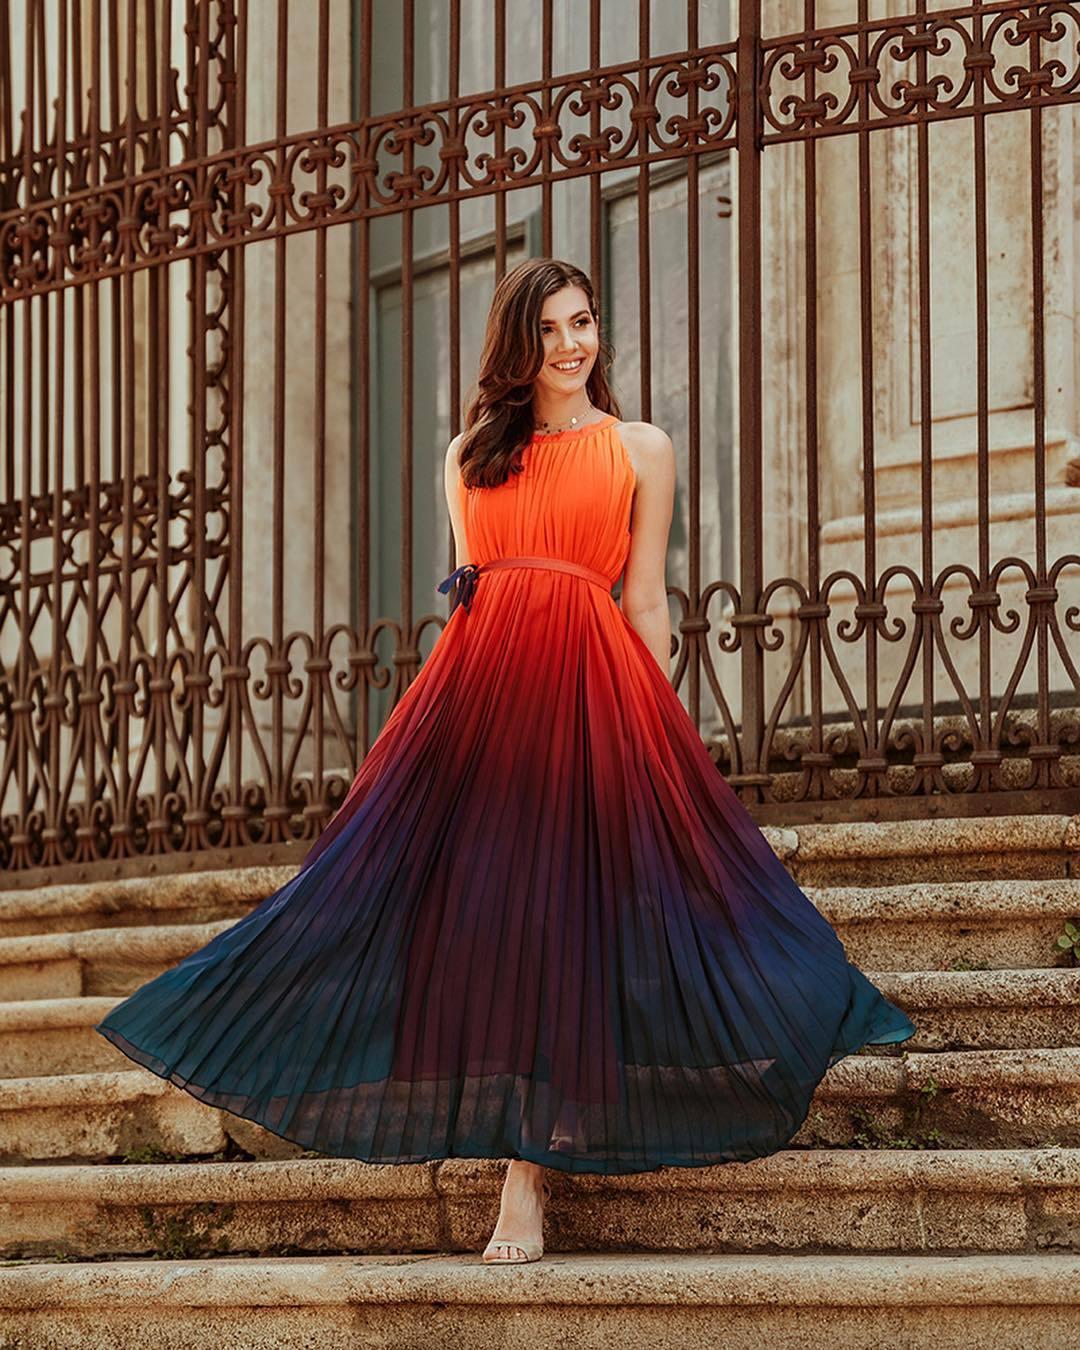 dress pleated dress sleeveless dress maxi dress elegant dress ombre dress sandals belted dress